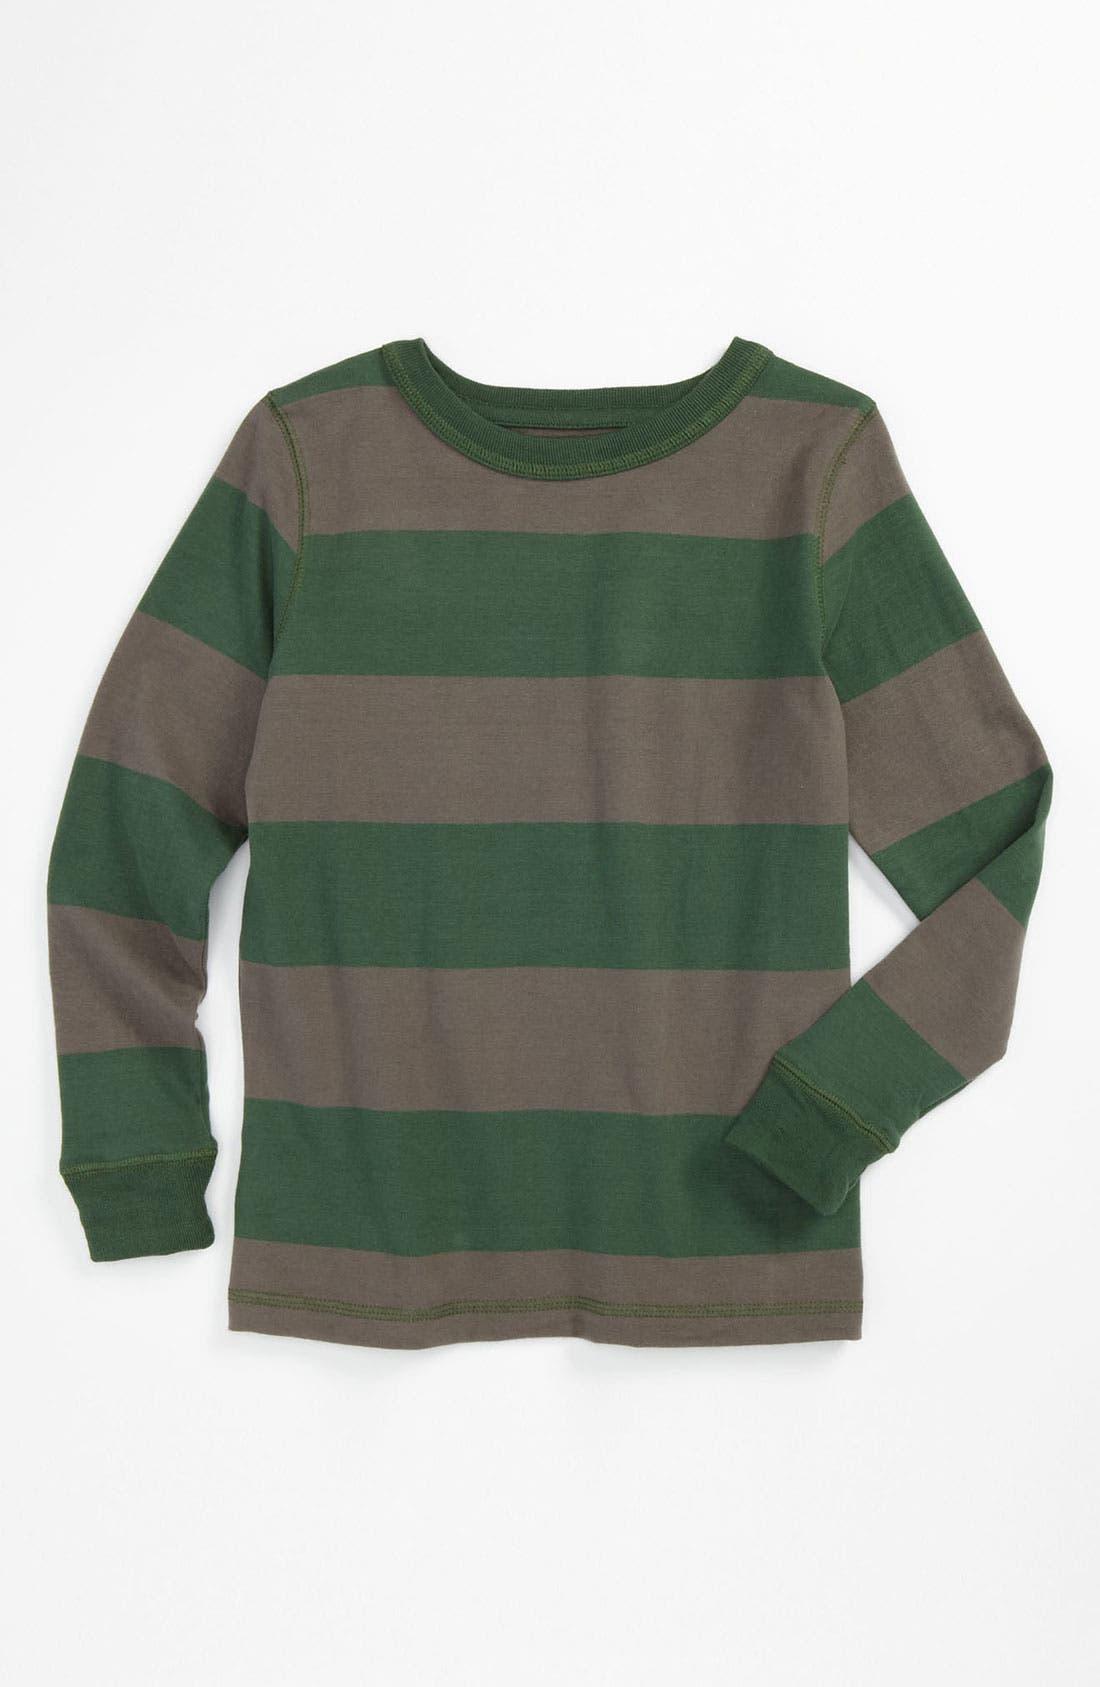 Alternate Image 1 Selected - Peek 'Corbett' Sueded Crewneck T-Shirt (Toddler, Little Boys & Big Boys)